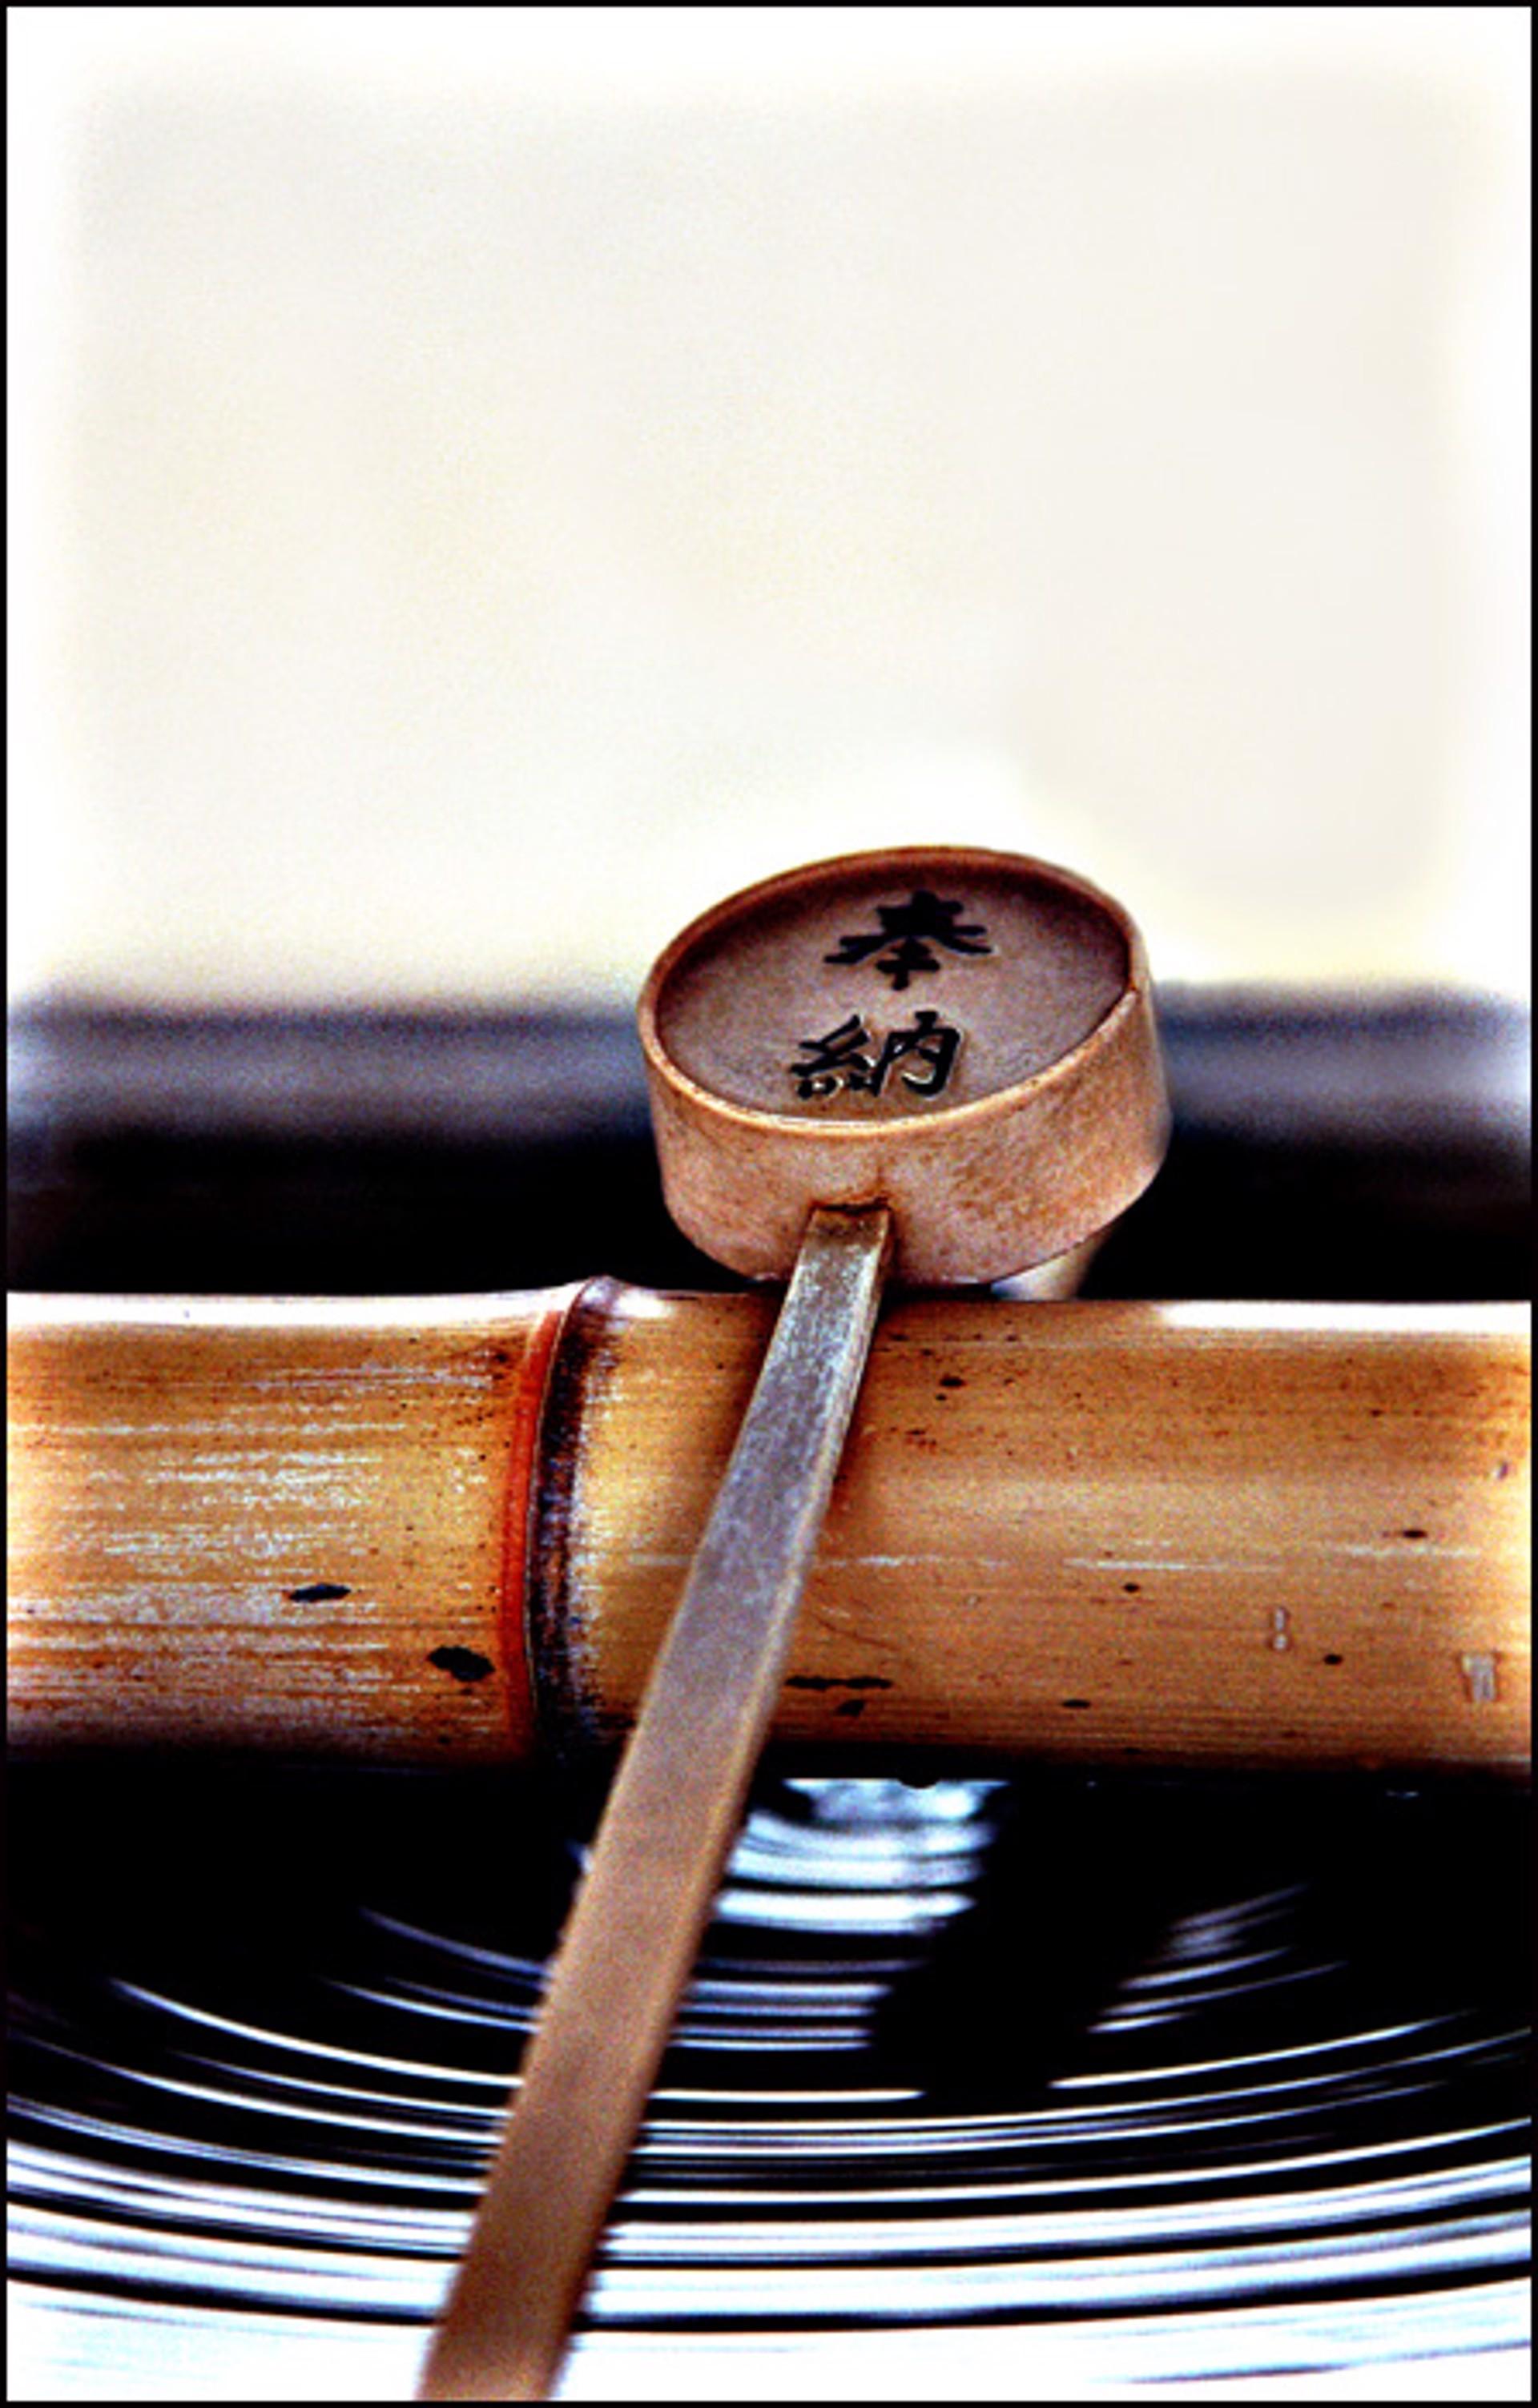 Bamboo Ladle for Purification by Oksana Perkins